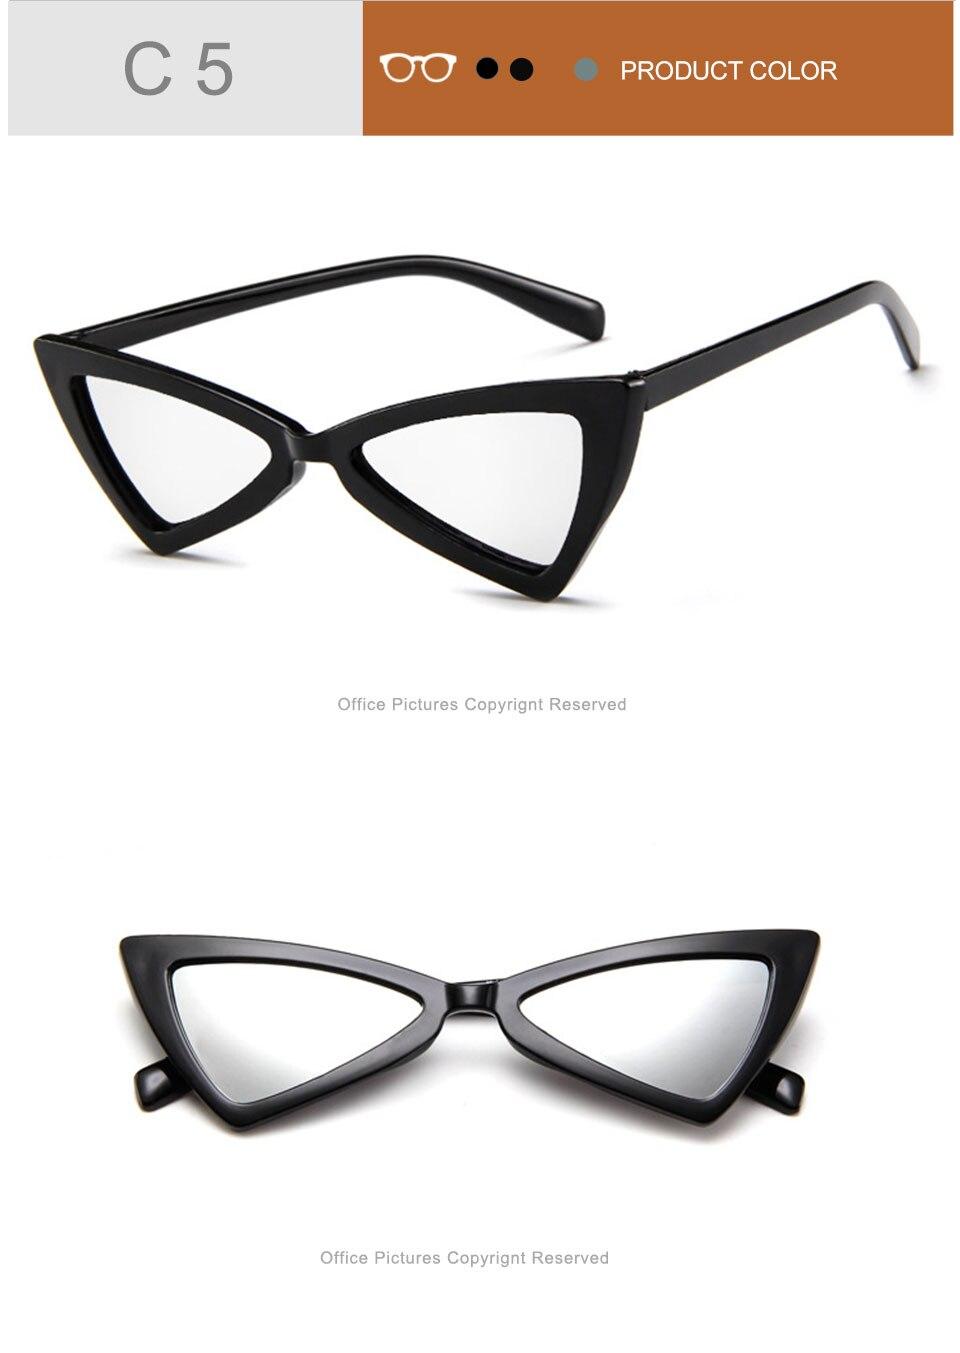 Detalle Comentarios Preguntas sobre QETOU triángulo rojo gafas de ... 21056e7941d4